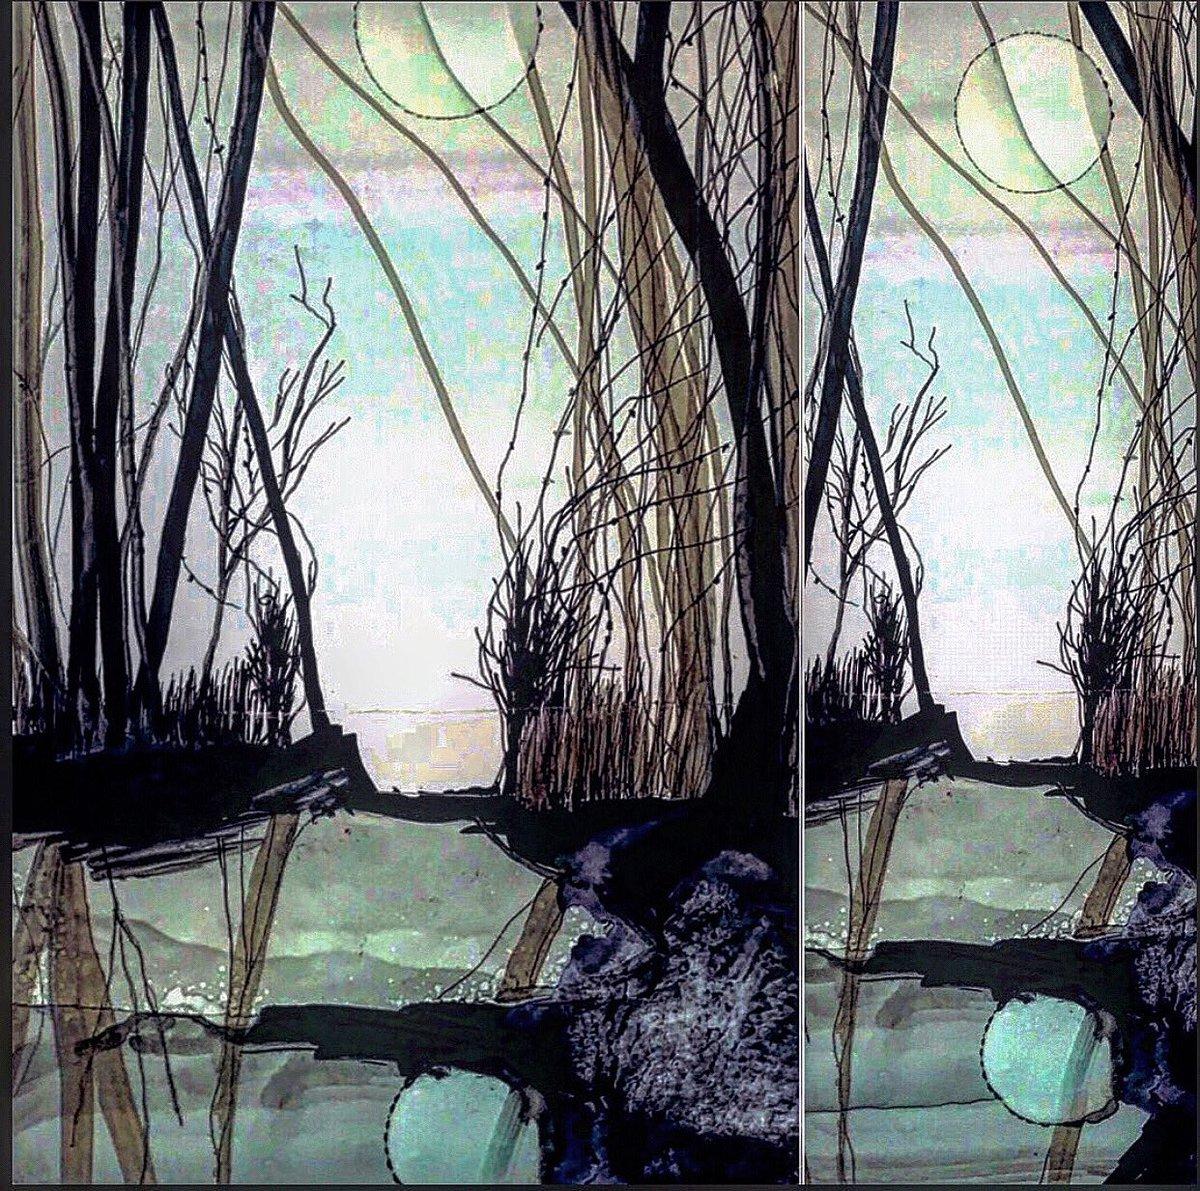 The Moon In The Lake.  Alcohol Inks Windsor&Newton ink and isopropyl #ArtistOnTwitter #ink #contemporaryart #moon #painting #alcoholinks #PainterOfTheNightpic.twitter.com/ubEjUH5Wkd